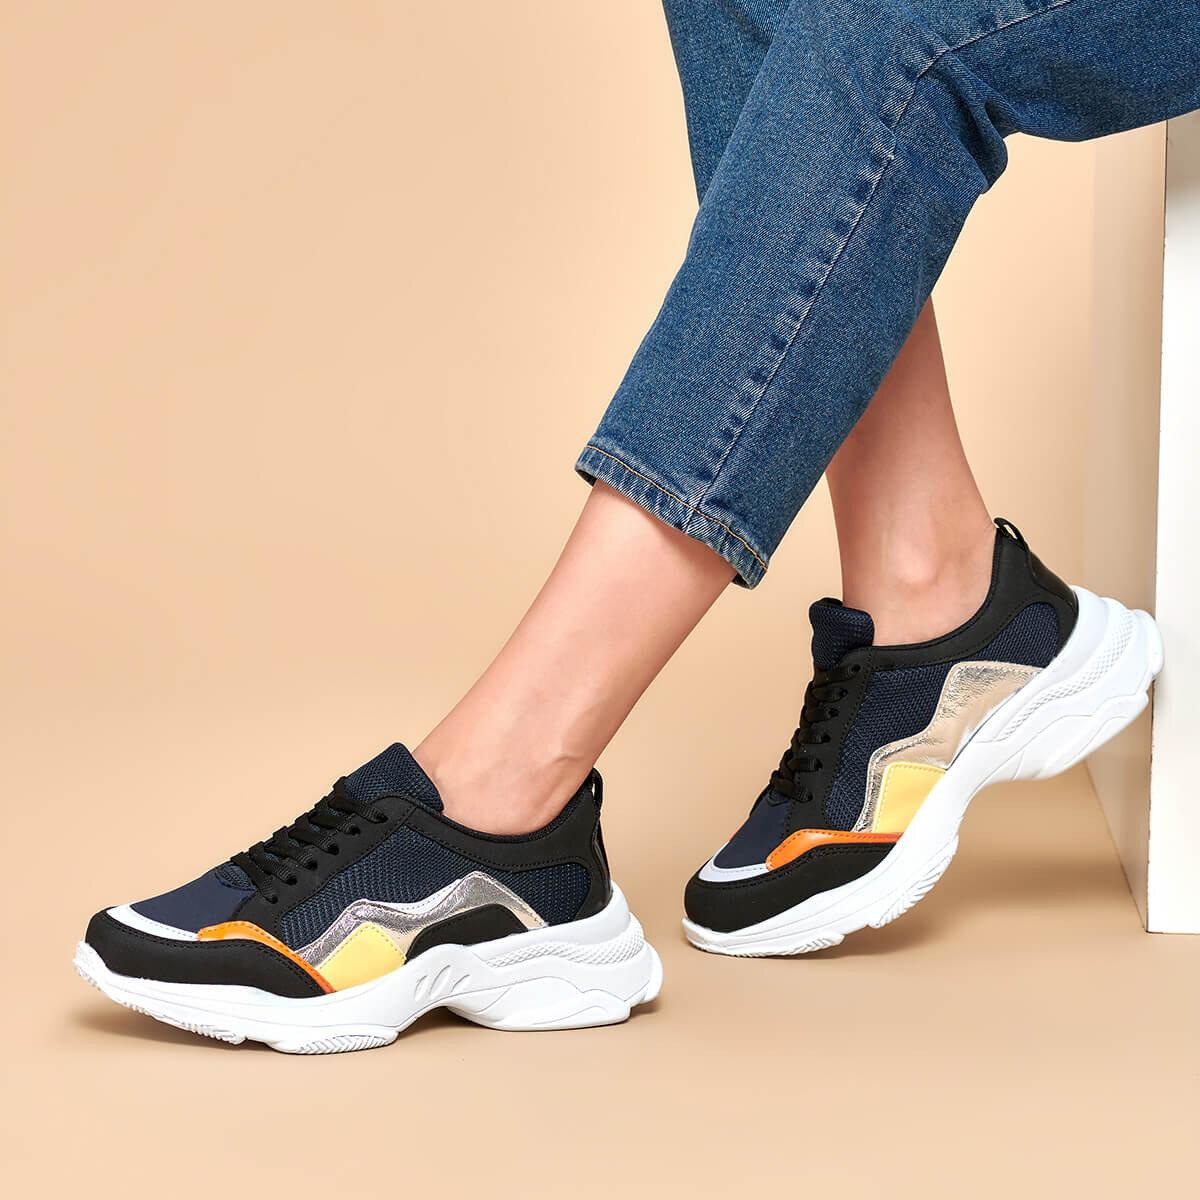 FLO 19K-070 Navy Blue Women 'S Sneaker Shoes BUTIGO